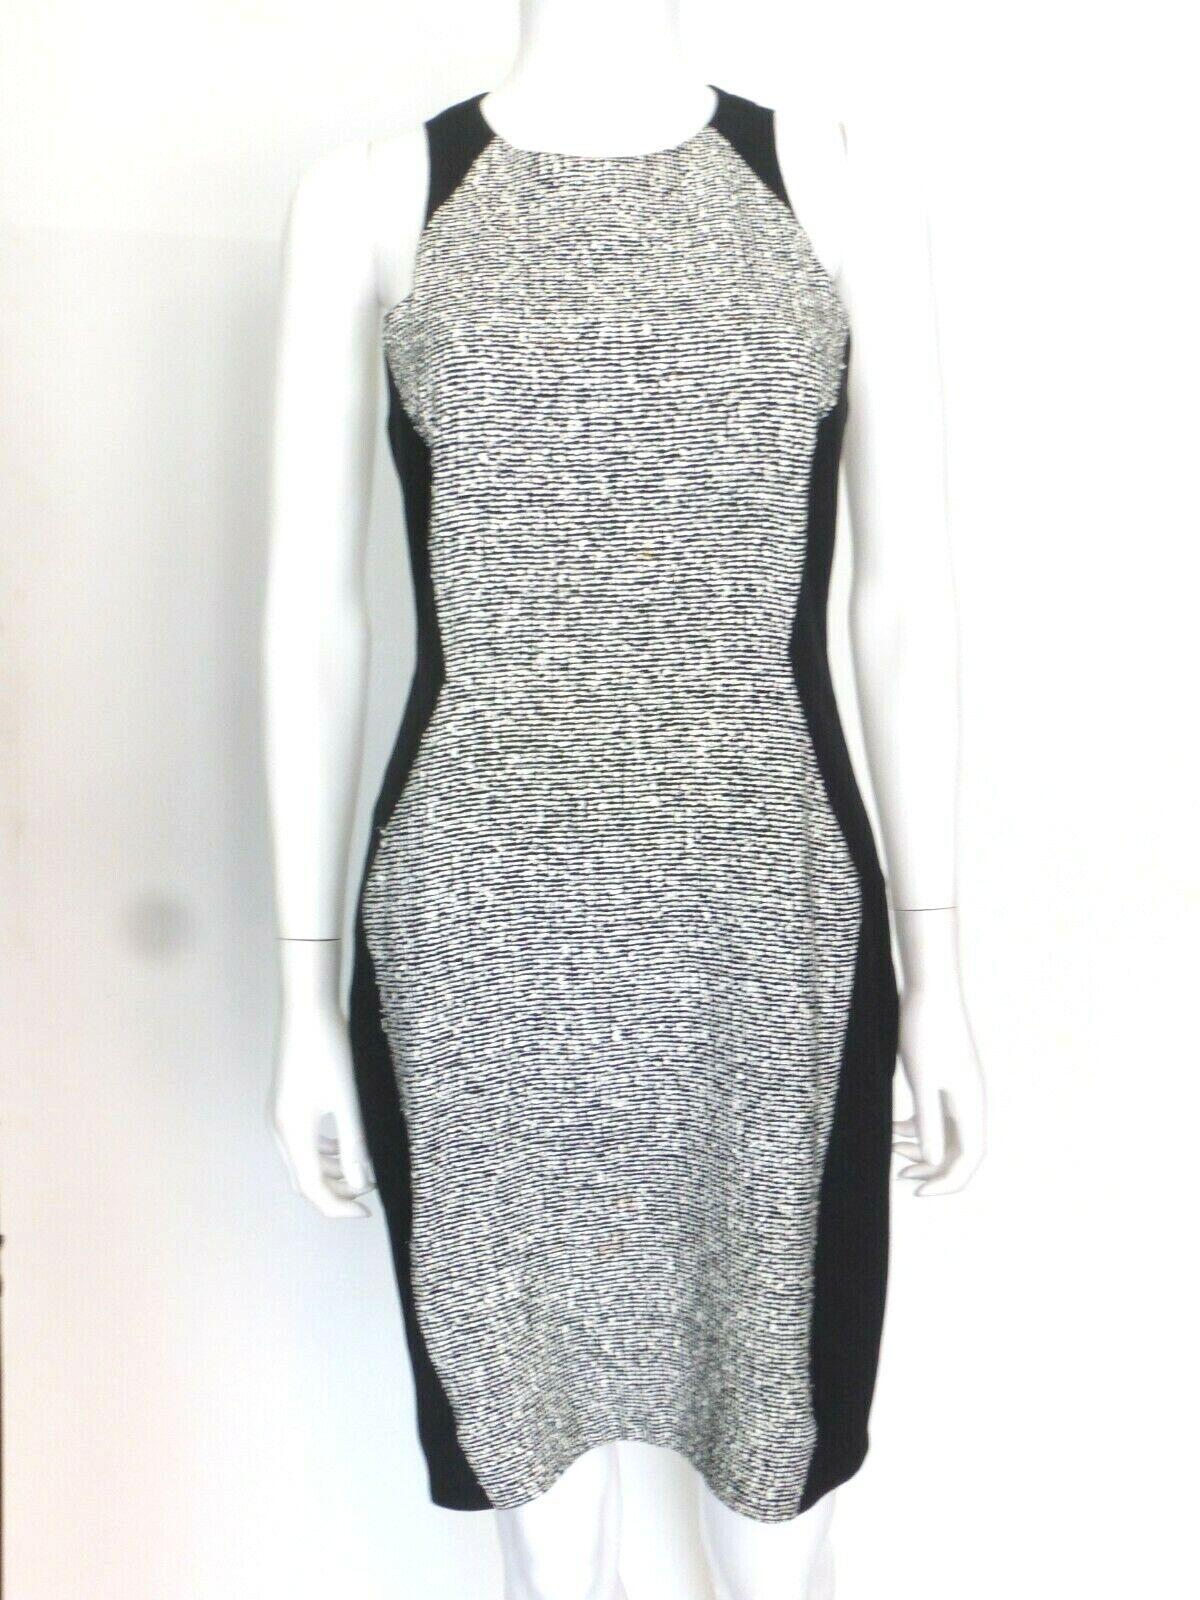 Rag & Bone schwarz Weiß Texturot Dress Sz 4 Eu 40